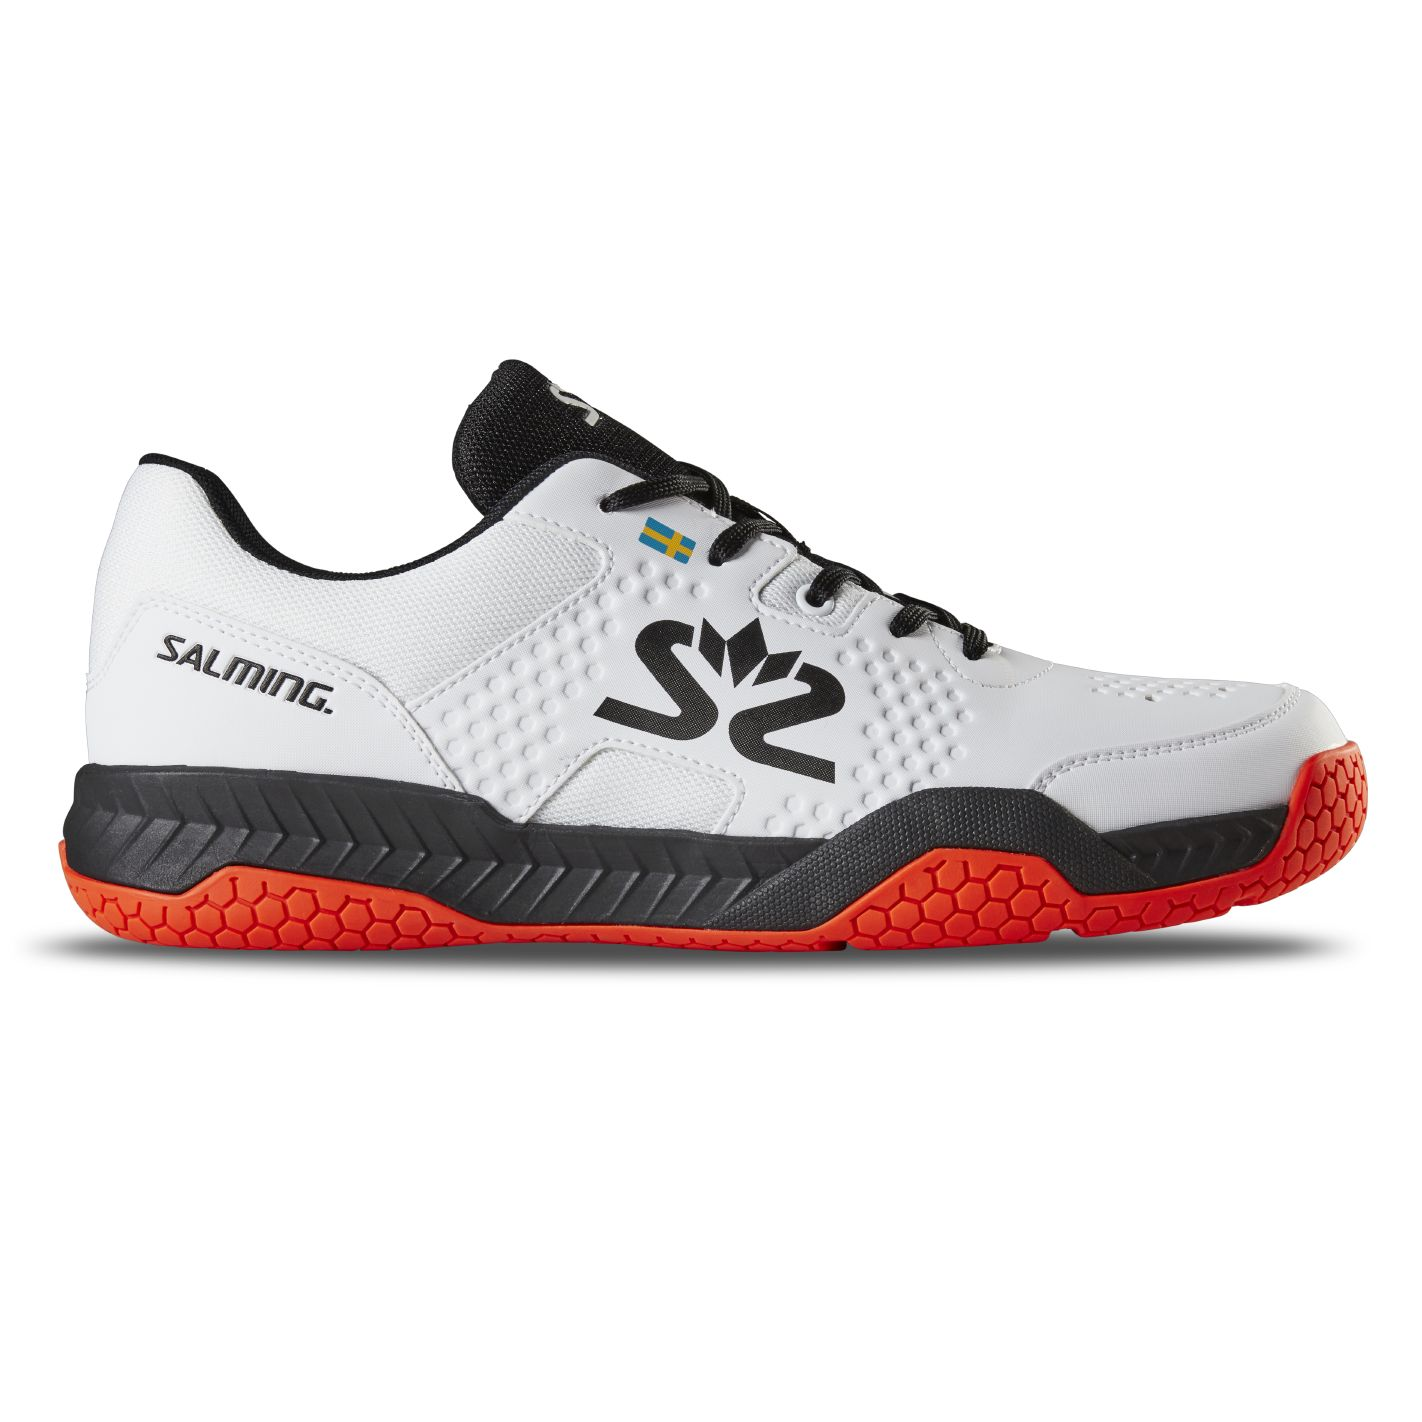 Salming Hawk Court Shoe Men White/Black 9,5 UK - 44 2/3 EUR - 28,5 cm